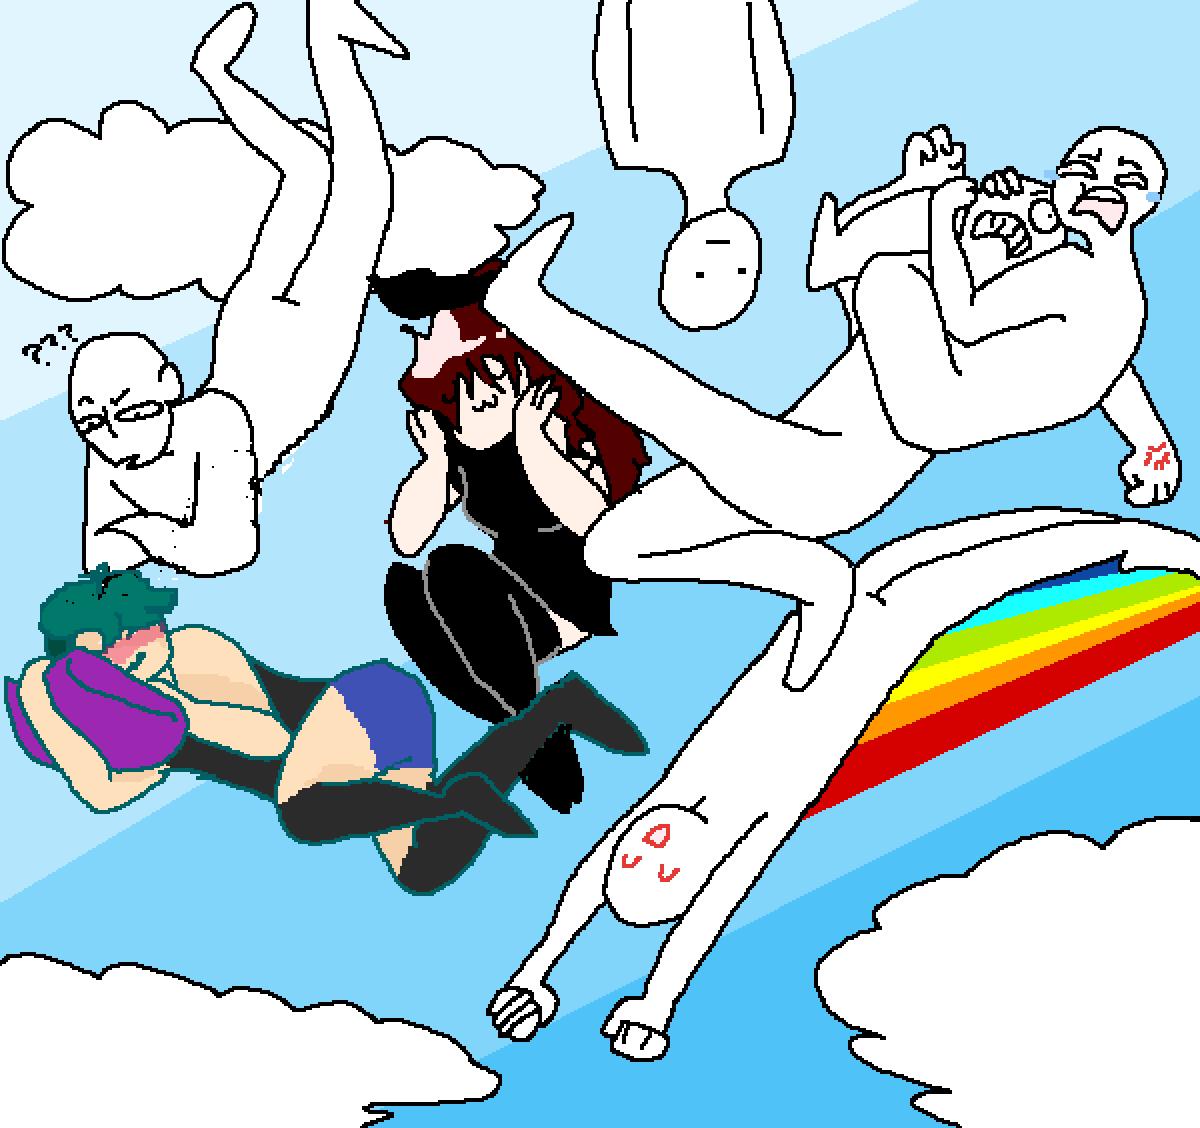 Flying in the sky by WarriorTrash